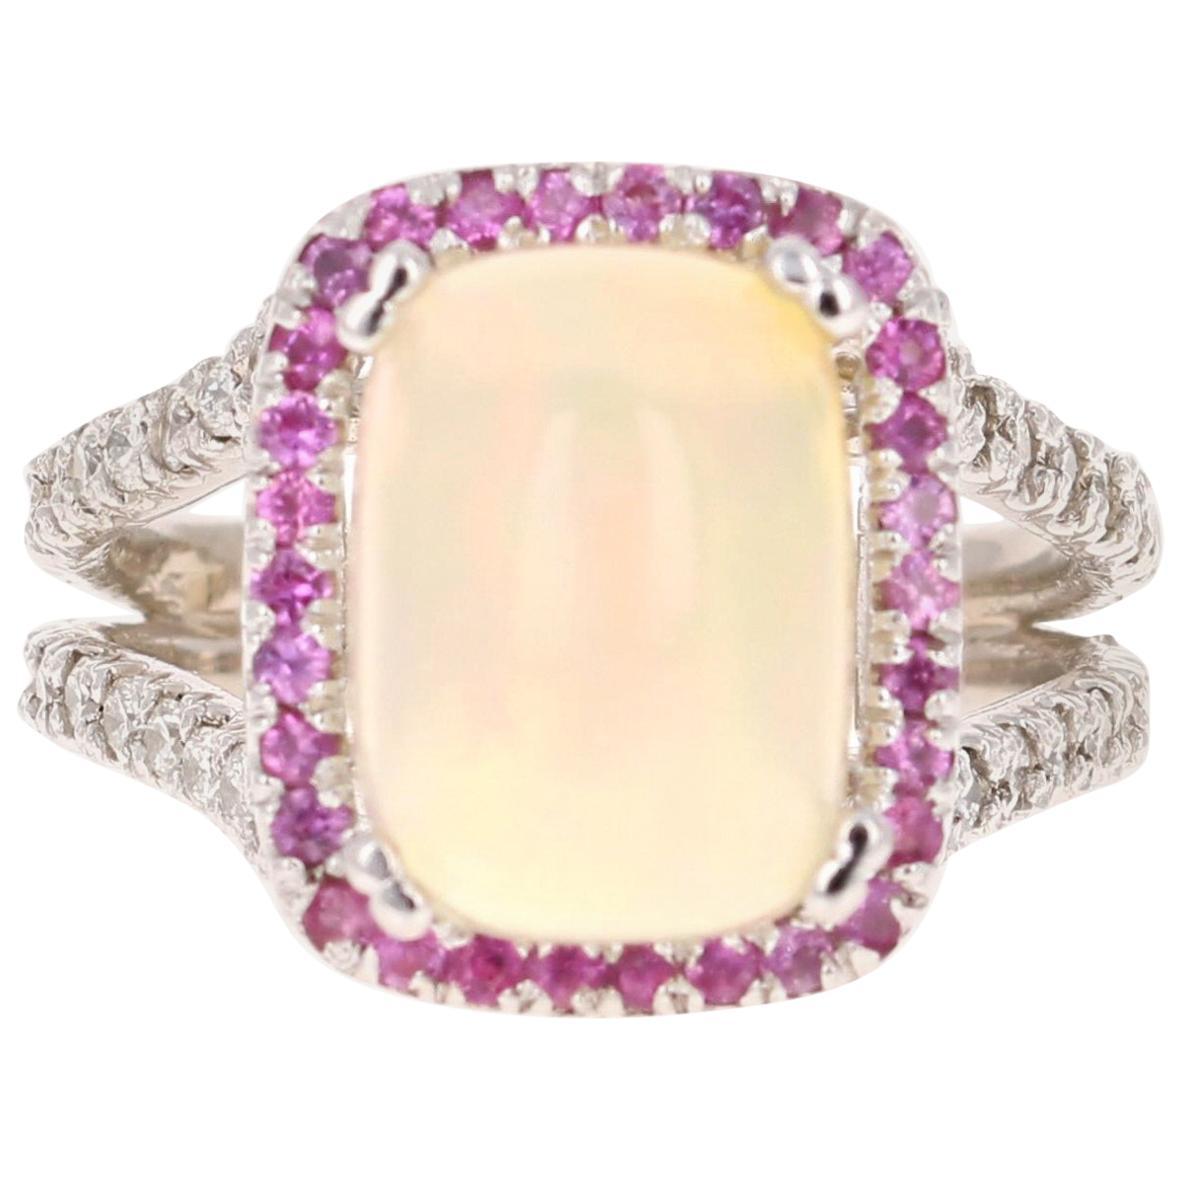 5.25 Carat Opal Pink Sapphire and Diamond 14 Karat White Gold Cocktail Ring